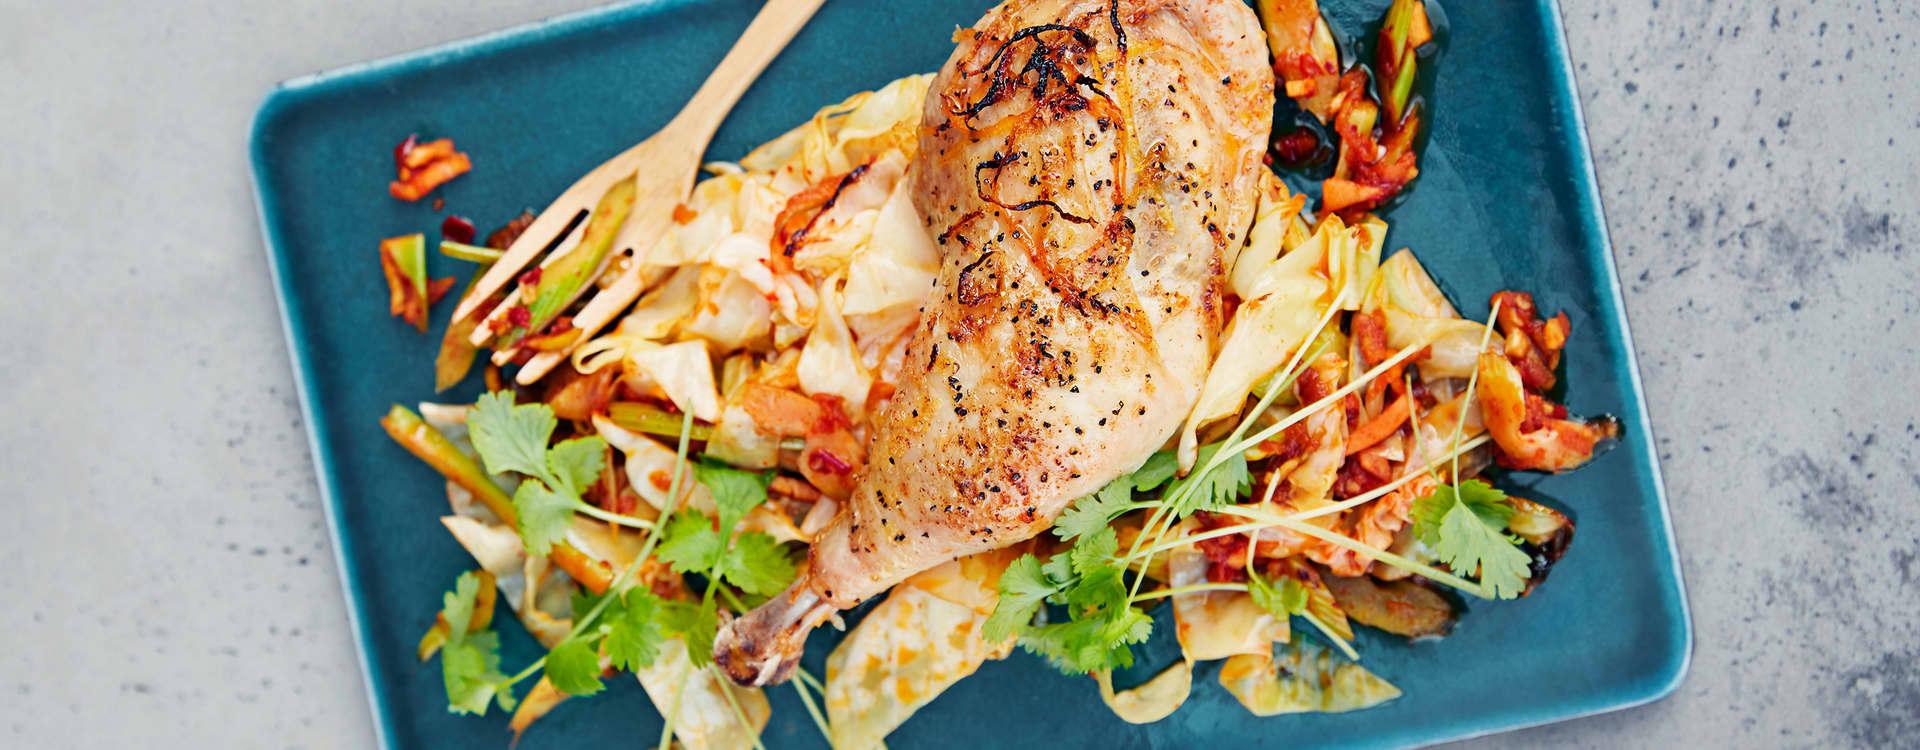 Ovnstekte kyllinglår med kimchikryddret kål